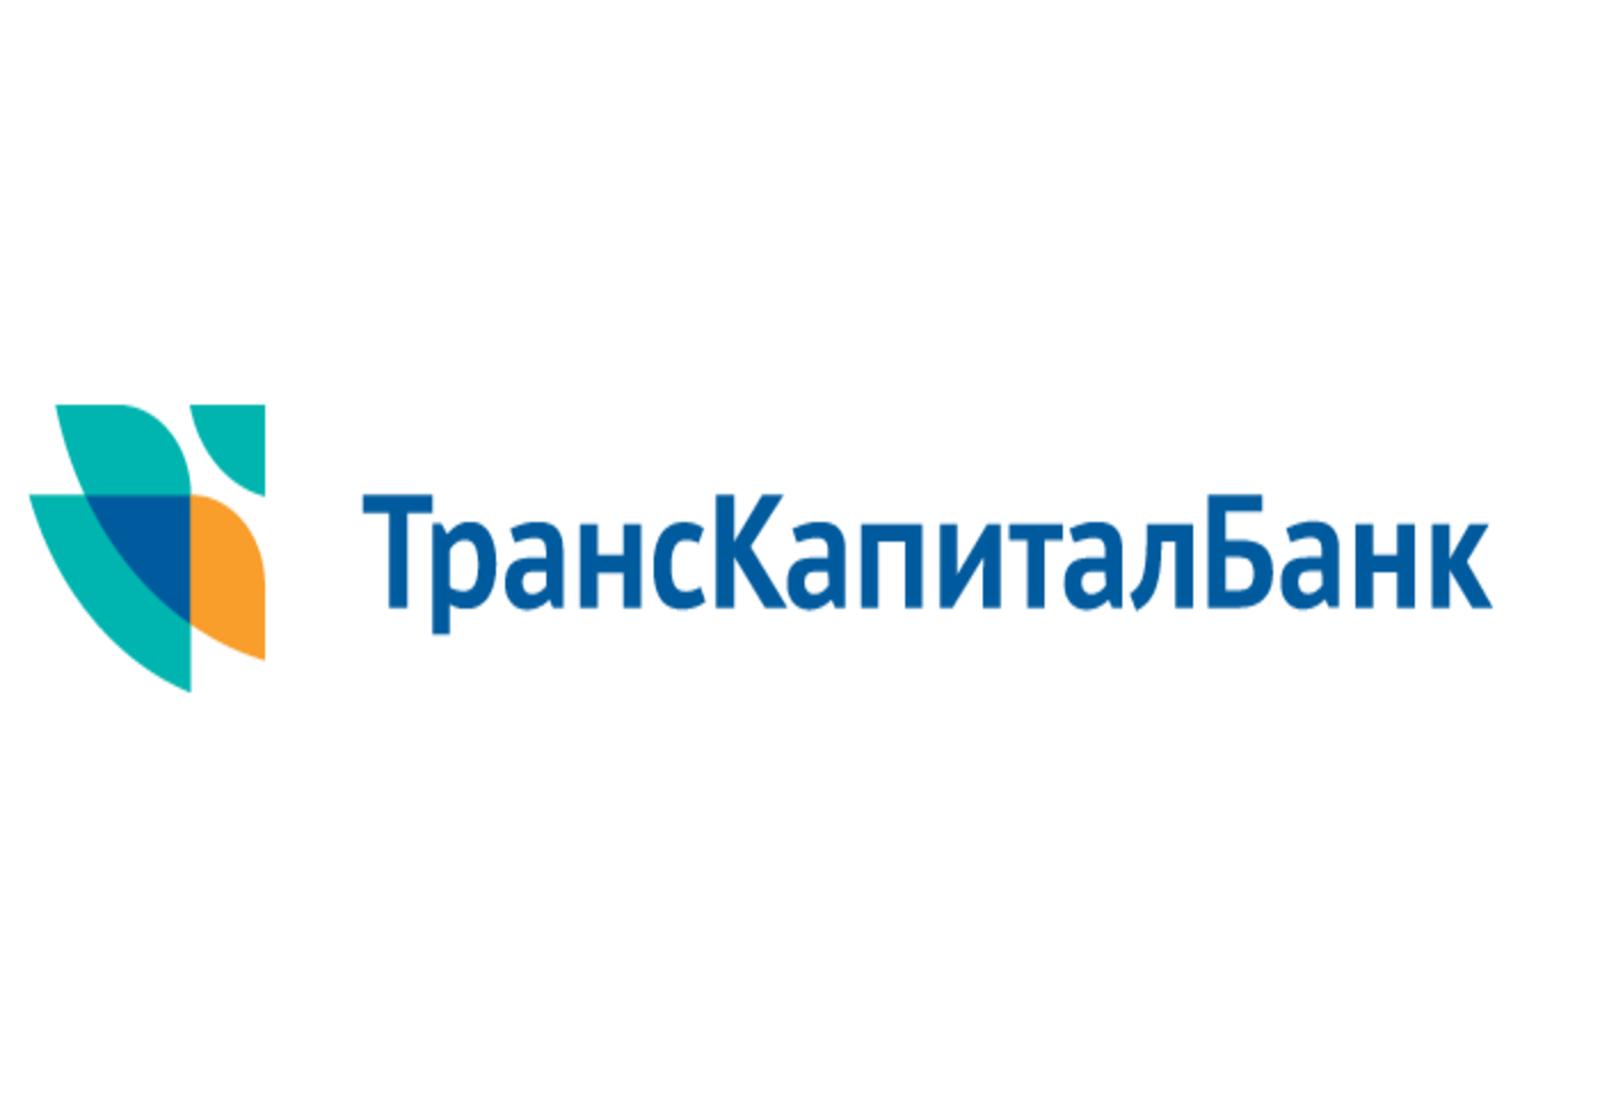 Ипотека в Транскапиталбанке